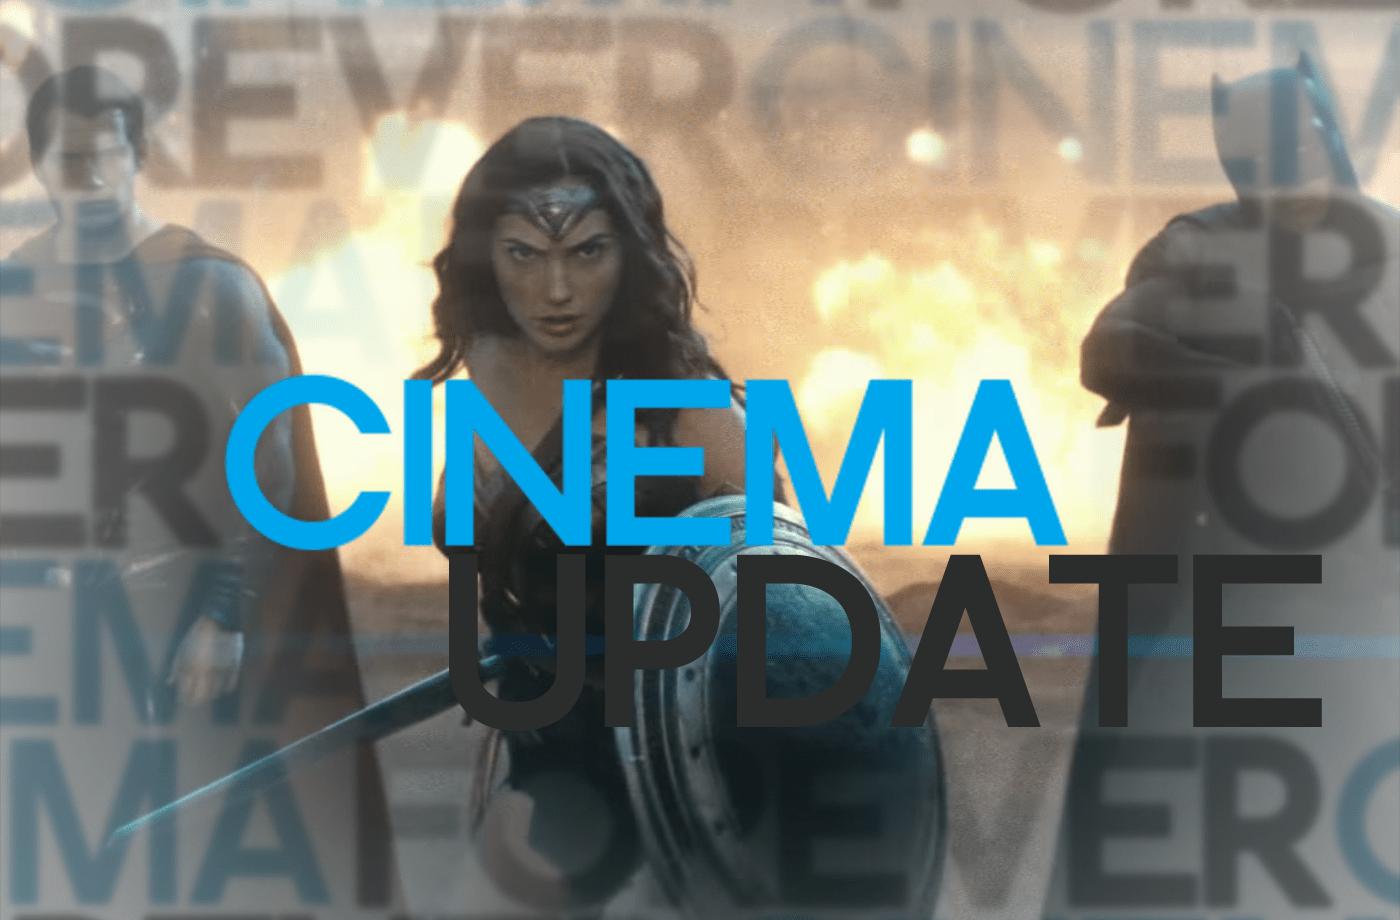 Podcast: Cinema Update #4 – Batman v Superman Special!